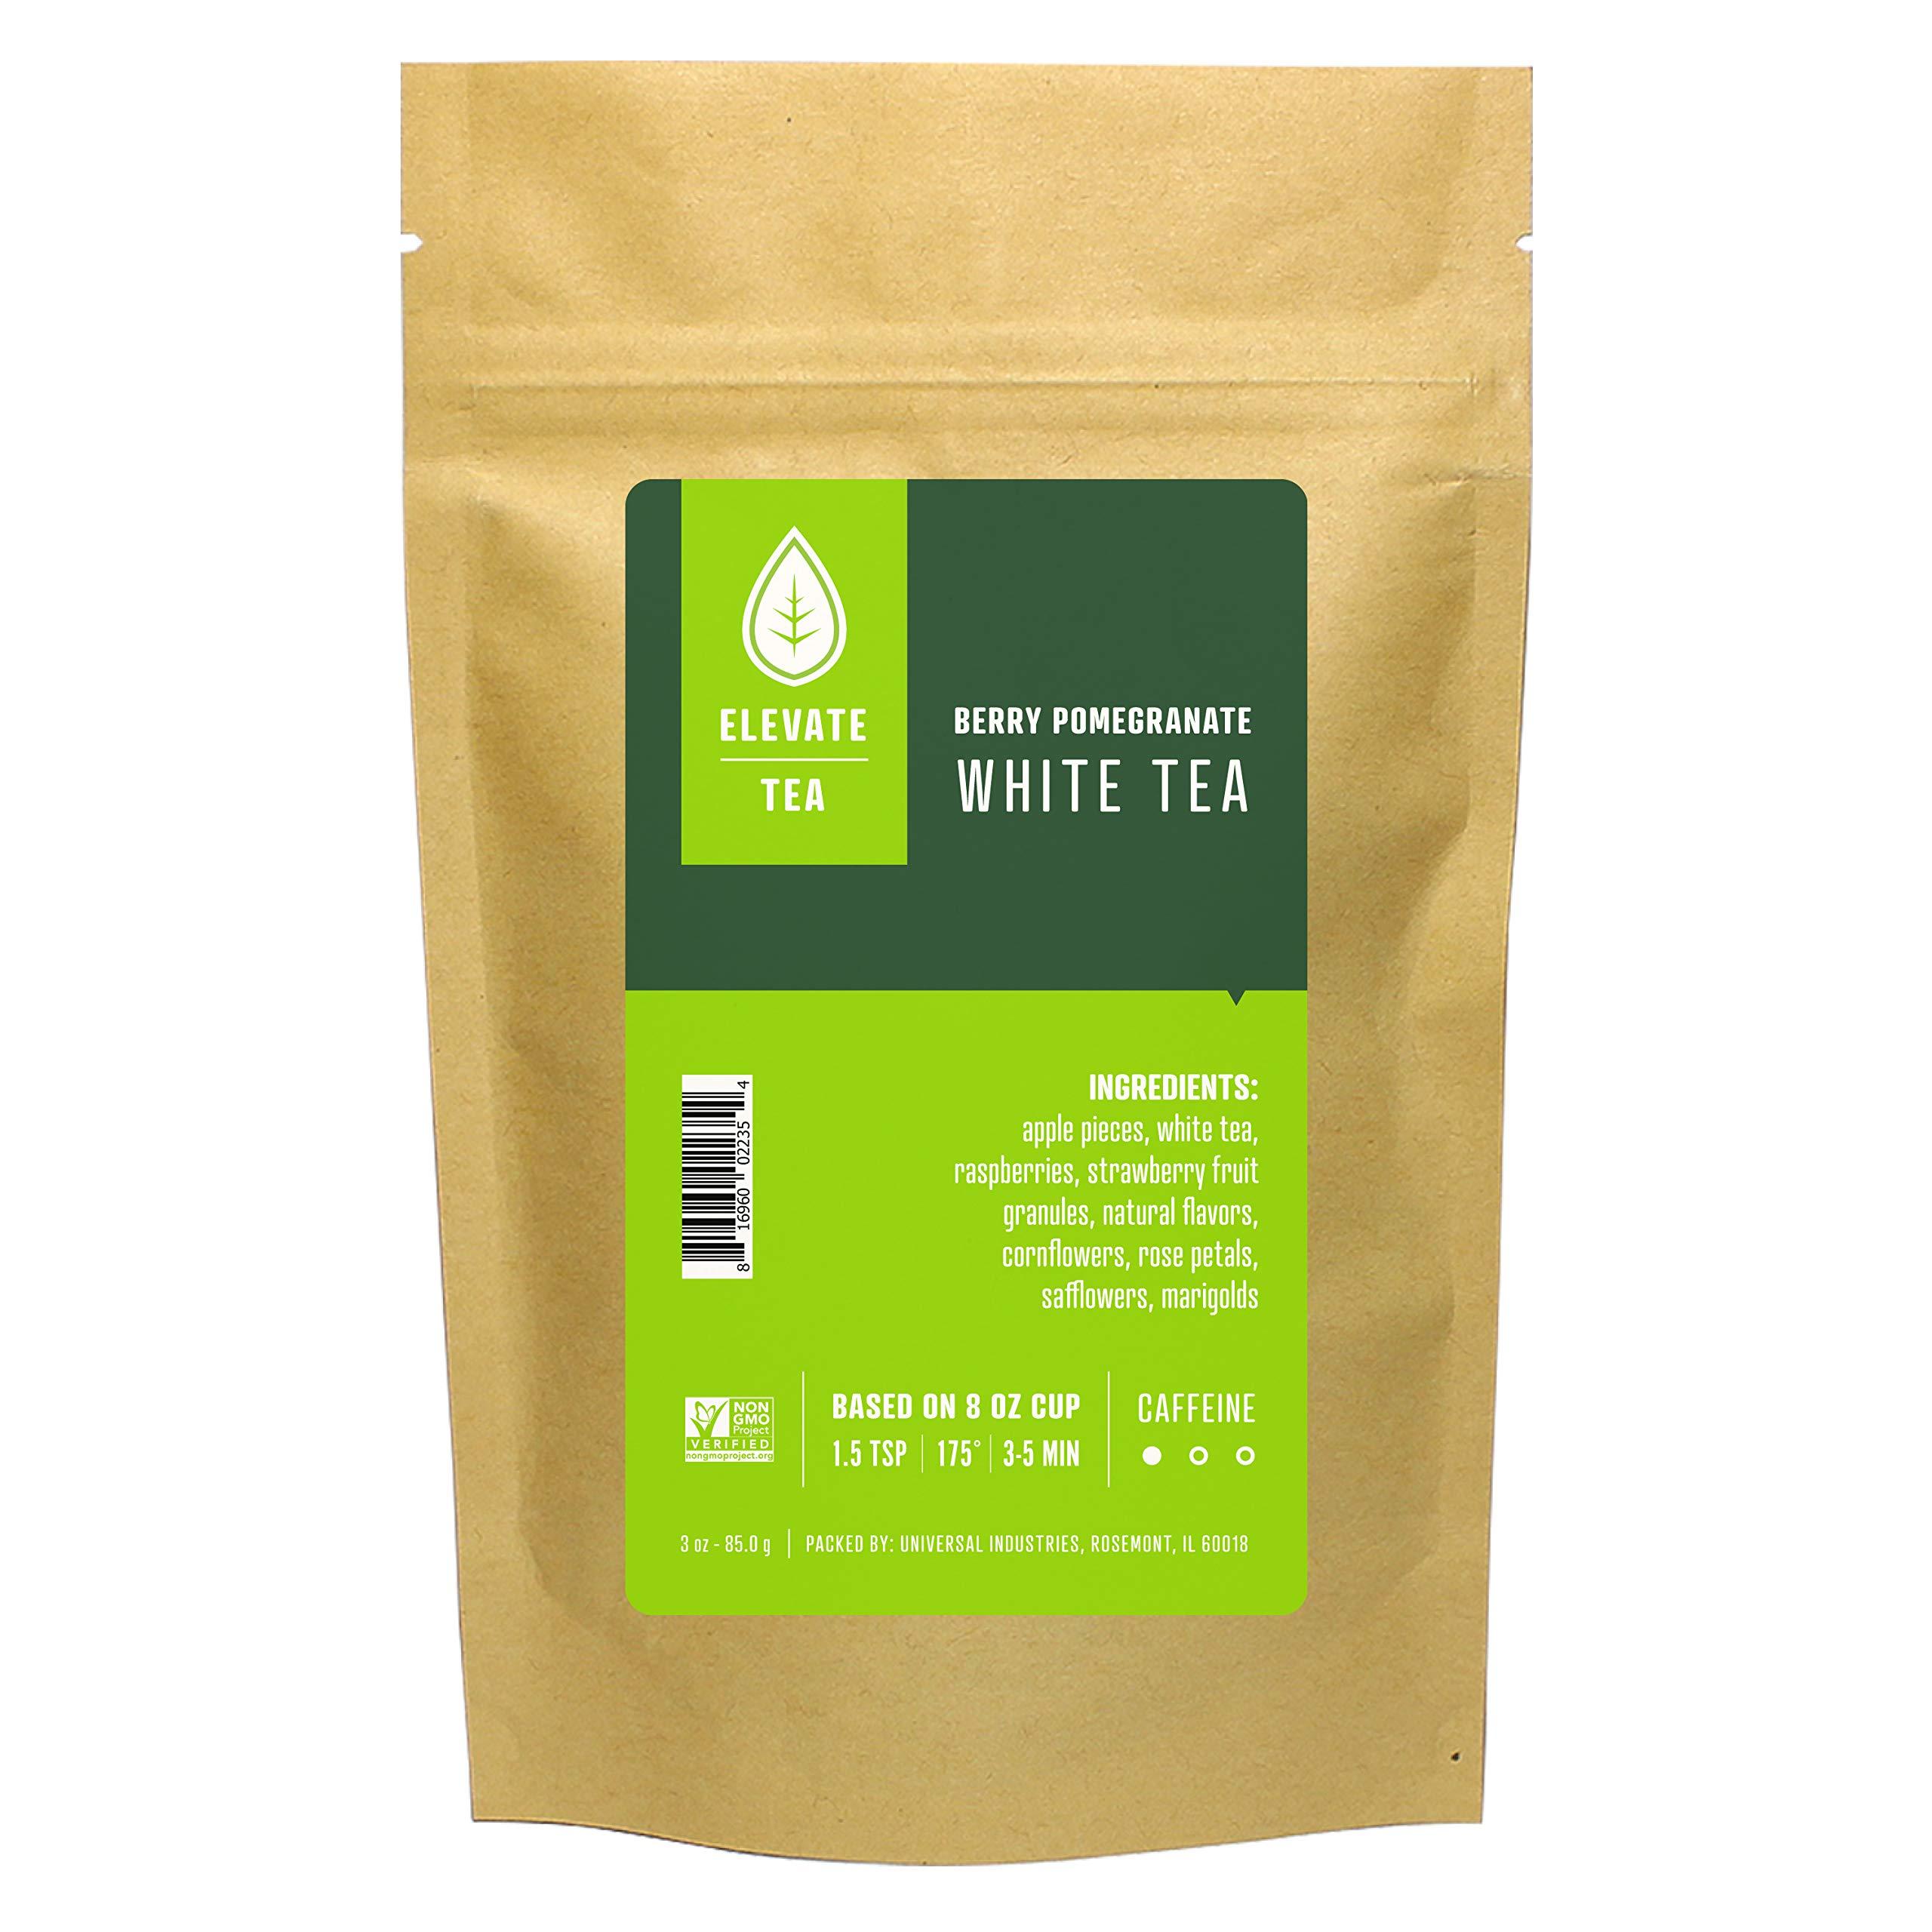 Elevate Tea BERRY POMEGRANATE WHITE TEA, Loose Leaf Tea Blend, 90 servings, 3-Pack of 3 Ounce Pouches, Caffeine Level: Medium